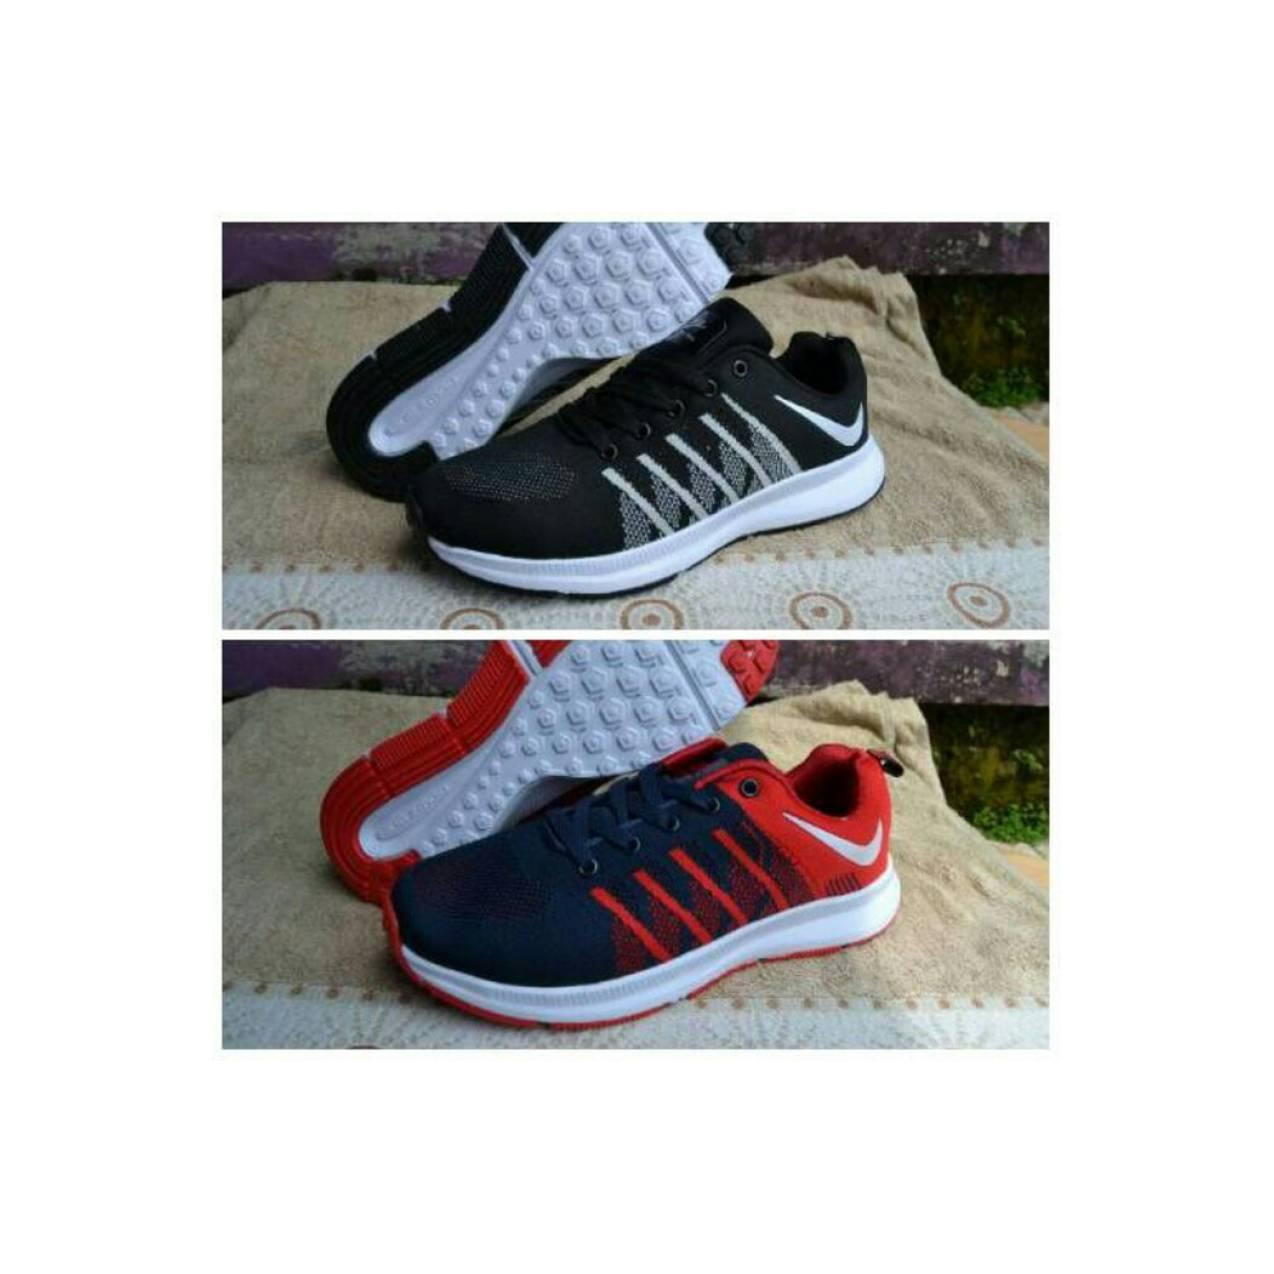 Sepatu sport nike airmax free pegasus zoom flyknit running aerobic neo